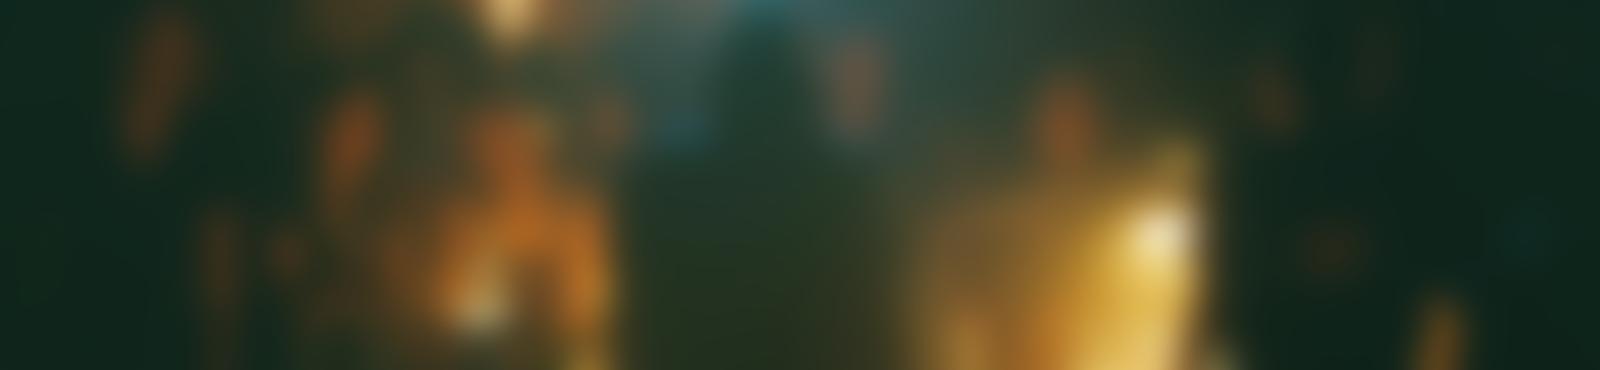 Blurred 4f450e7d 8f39 460d a40e d4dd83ab23cf